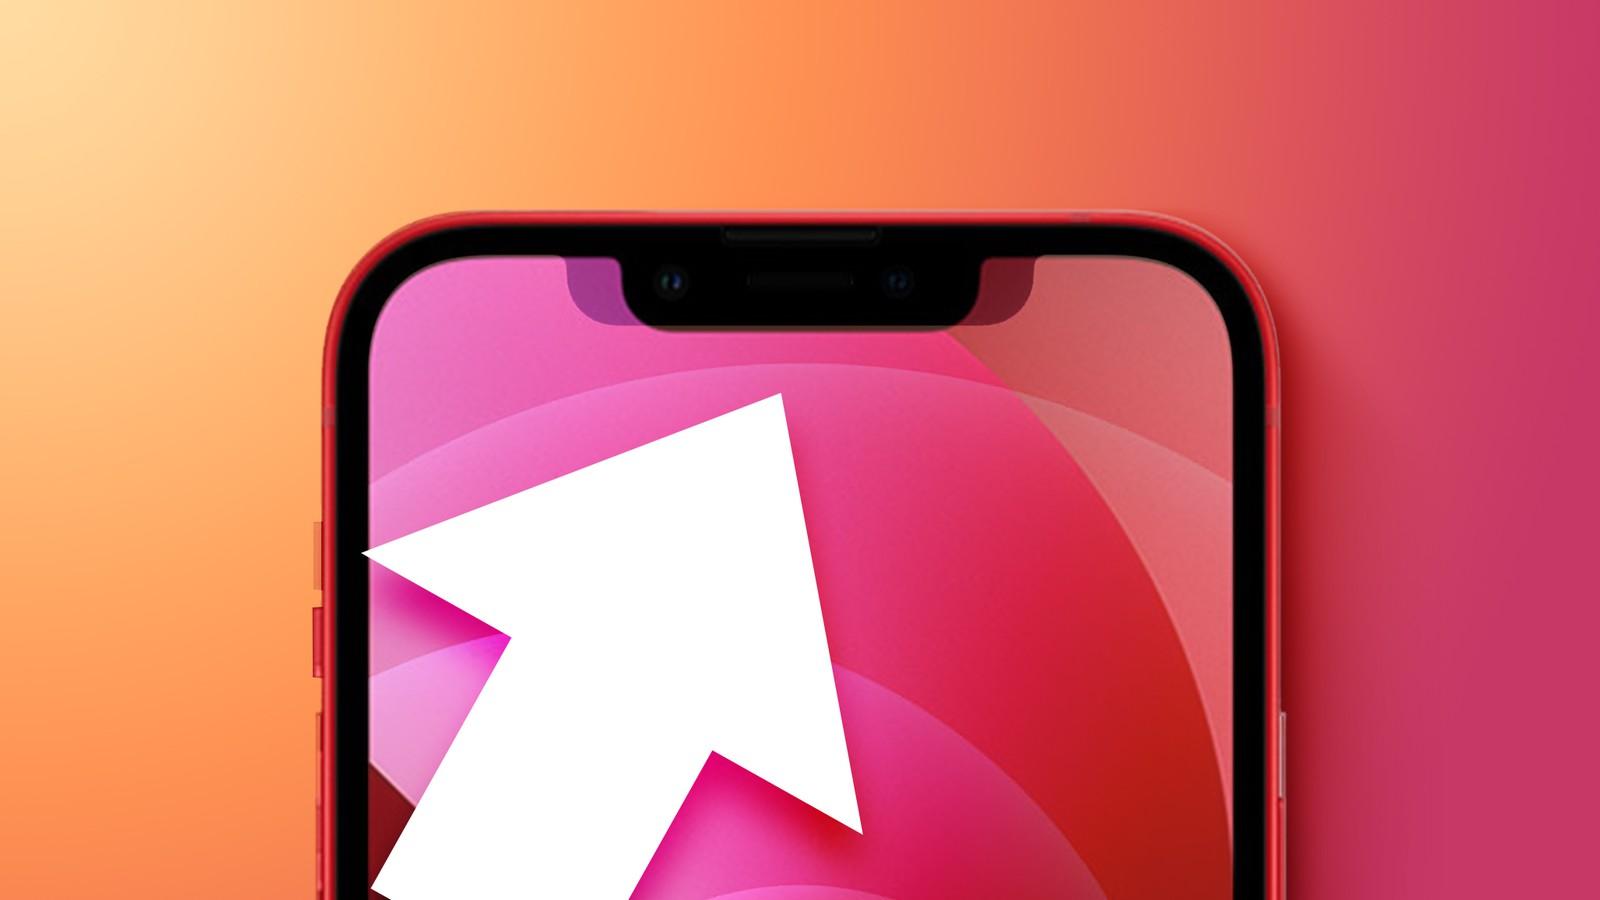 iphone 13 rendering